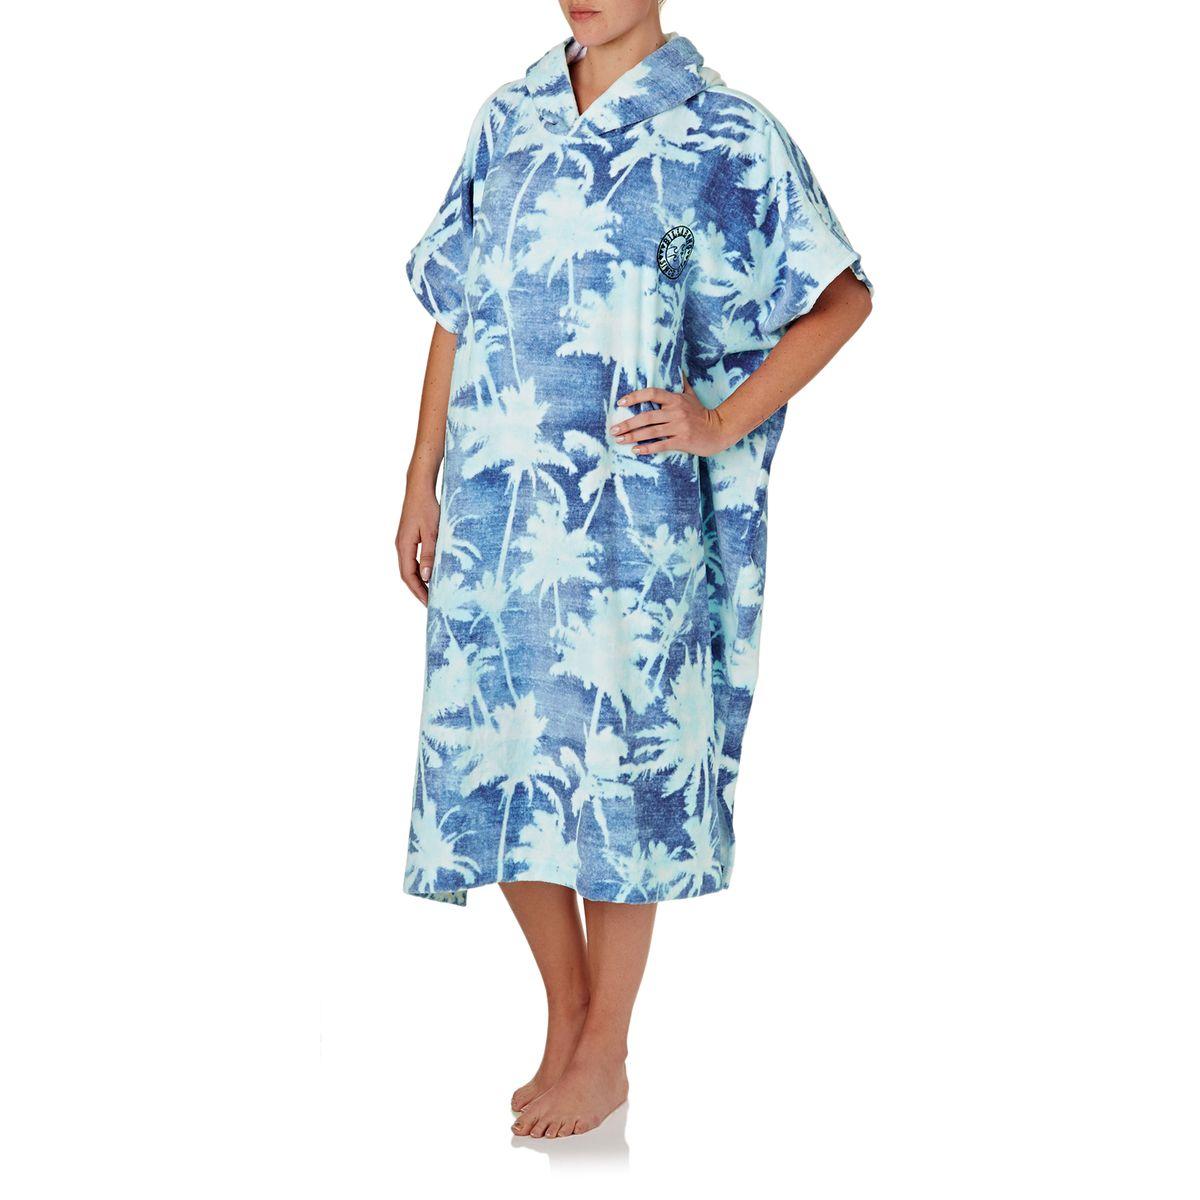 Billabong Surf Poncho Towel - Towel Image Aginggracefullyshow Com